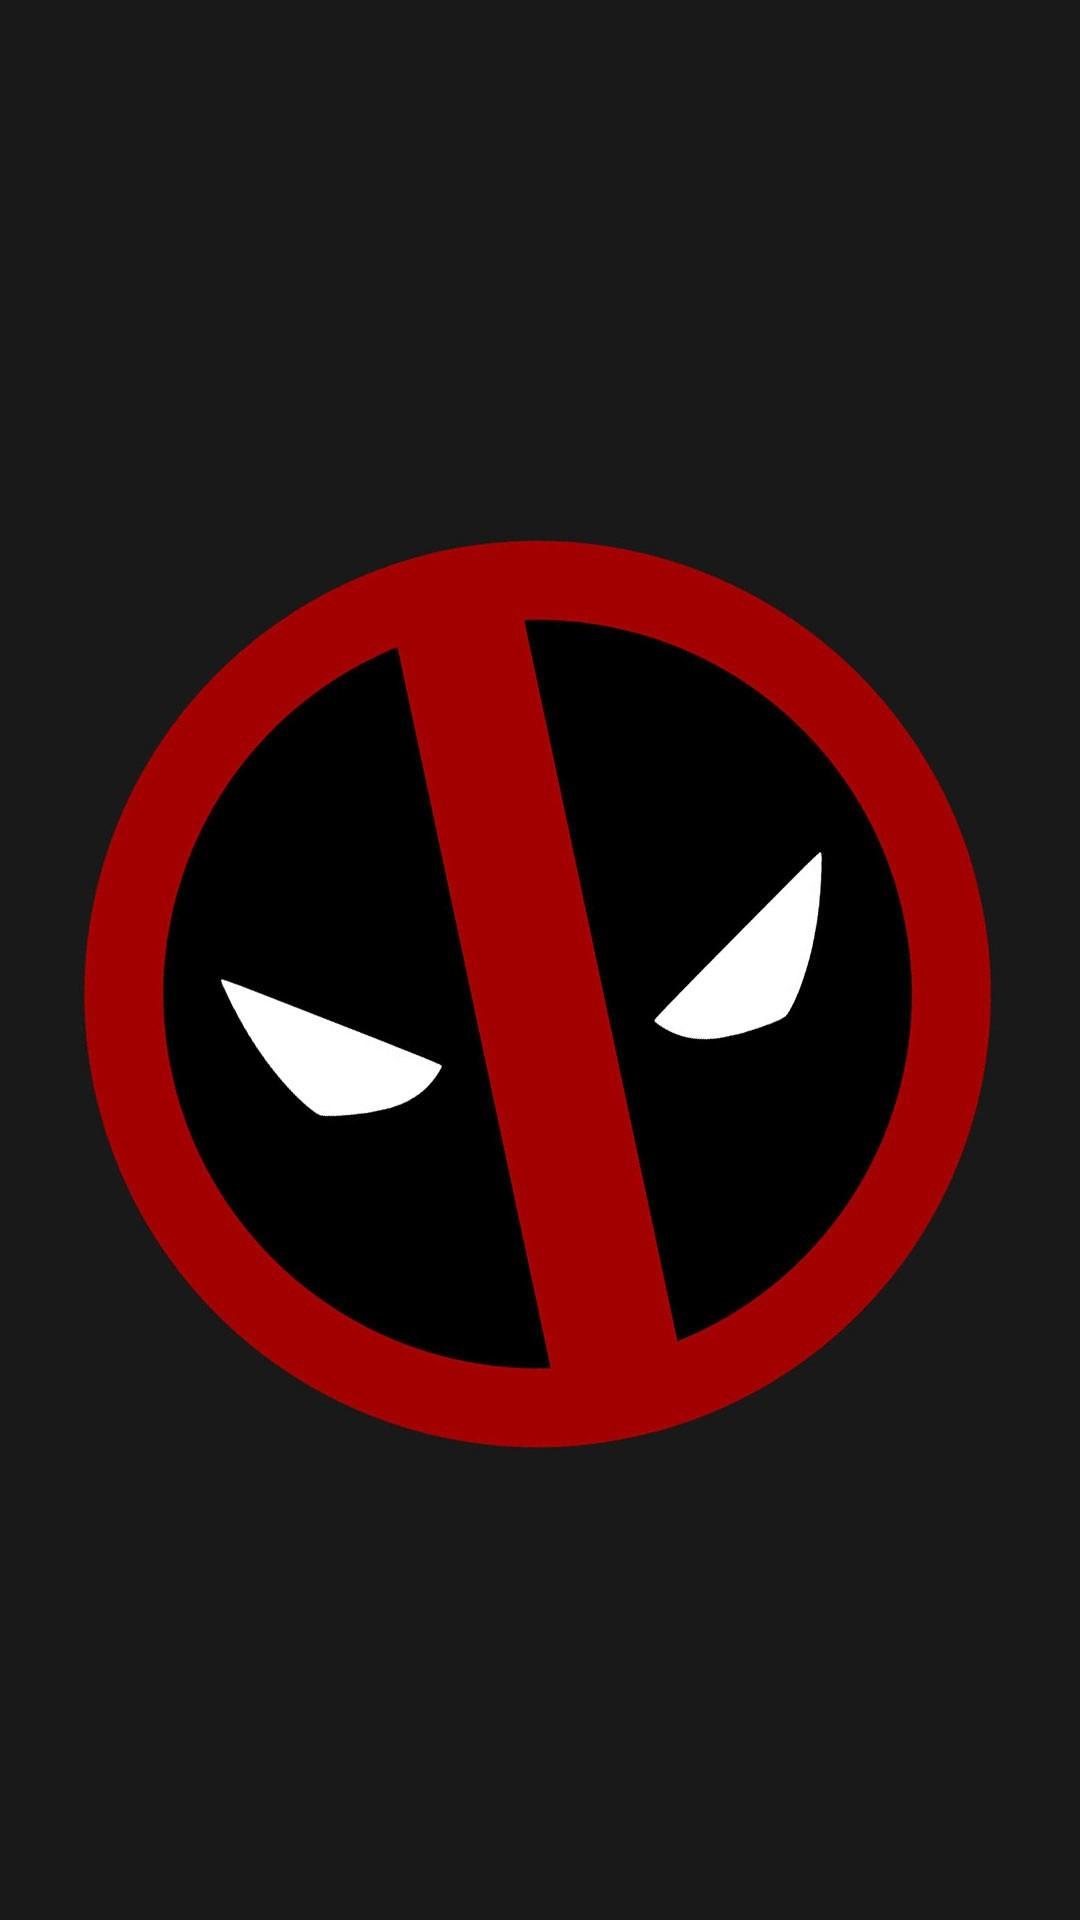 1920x1080 Deadpool Logo Wallpaper HD PixelsTalk Superhero Logo Wallpapers PixelsTalk Air Jordan Logo Wallpaper HD 1920x1080